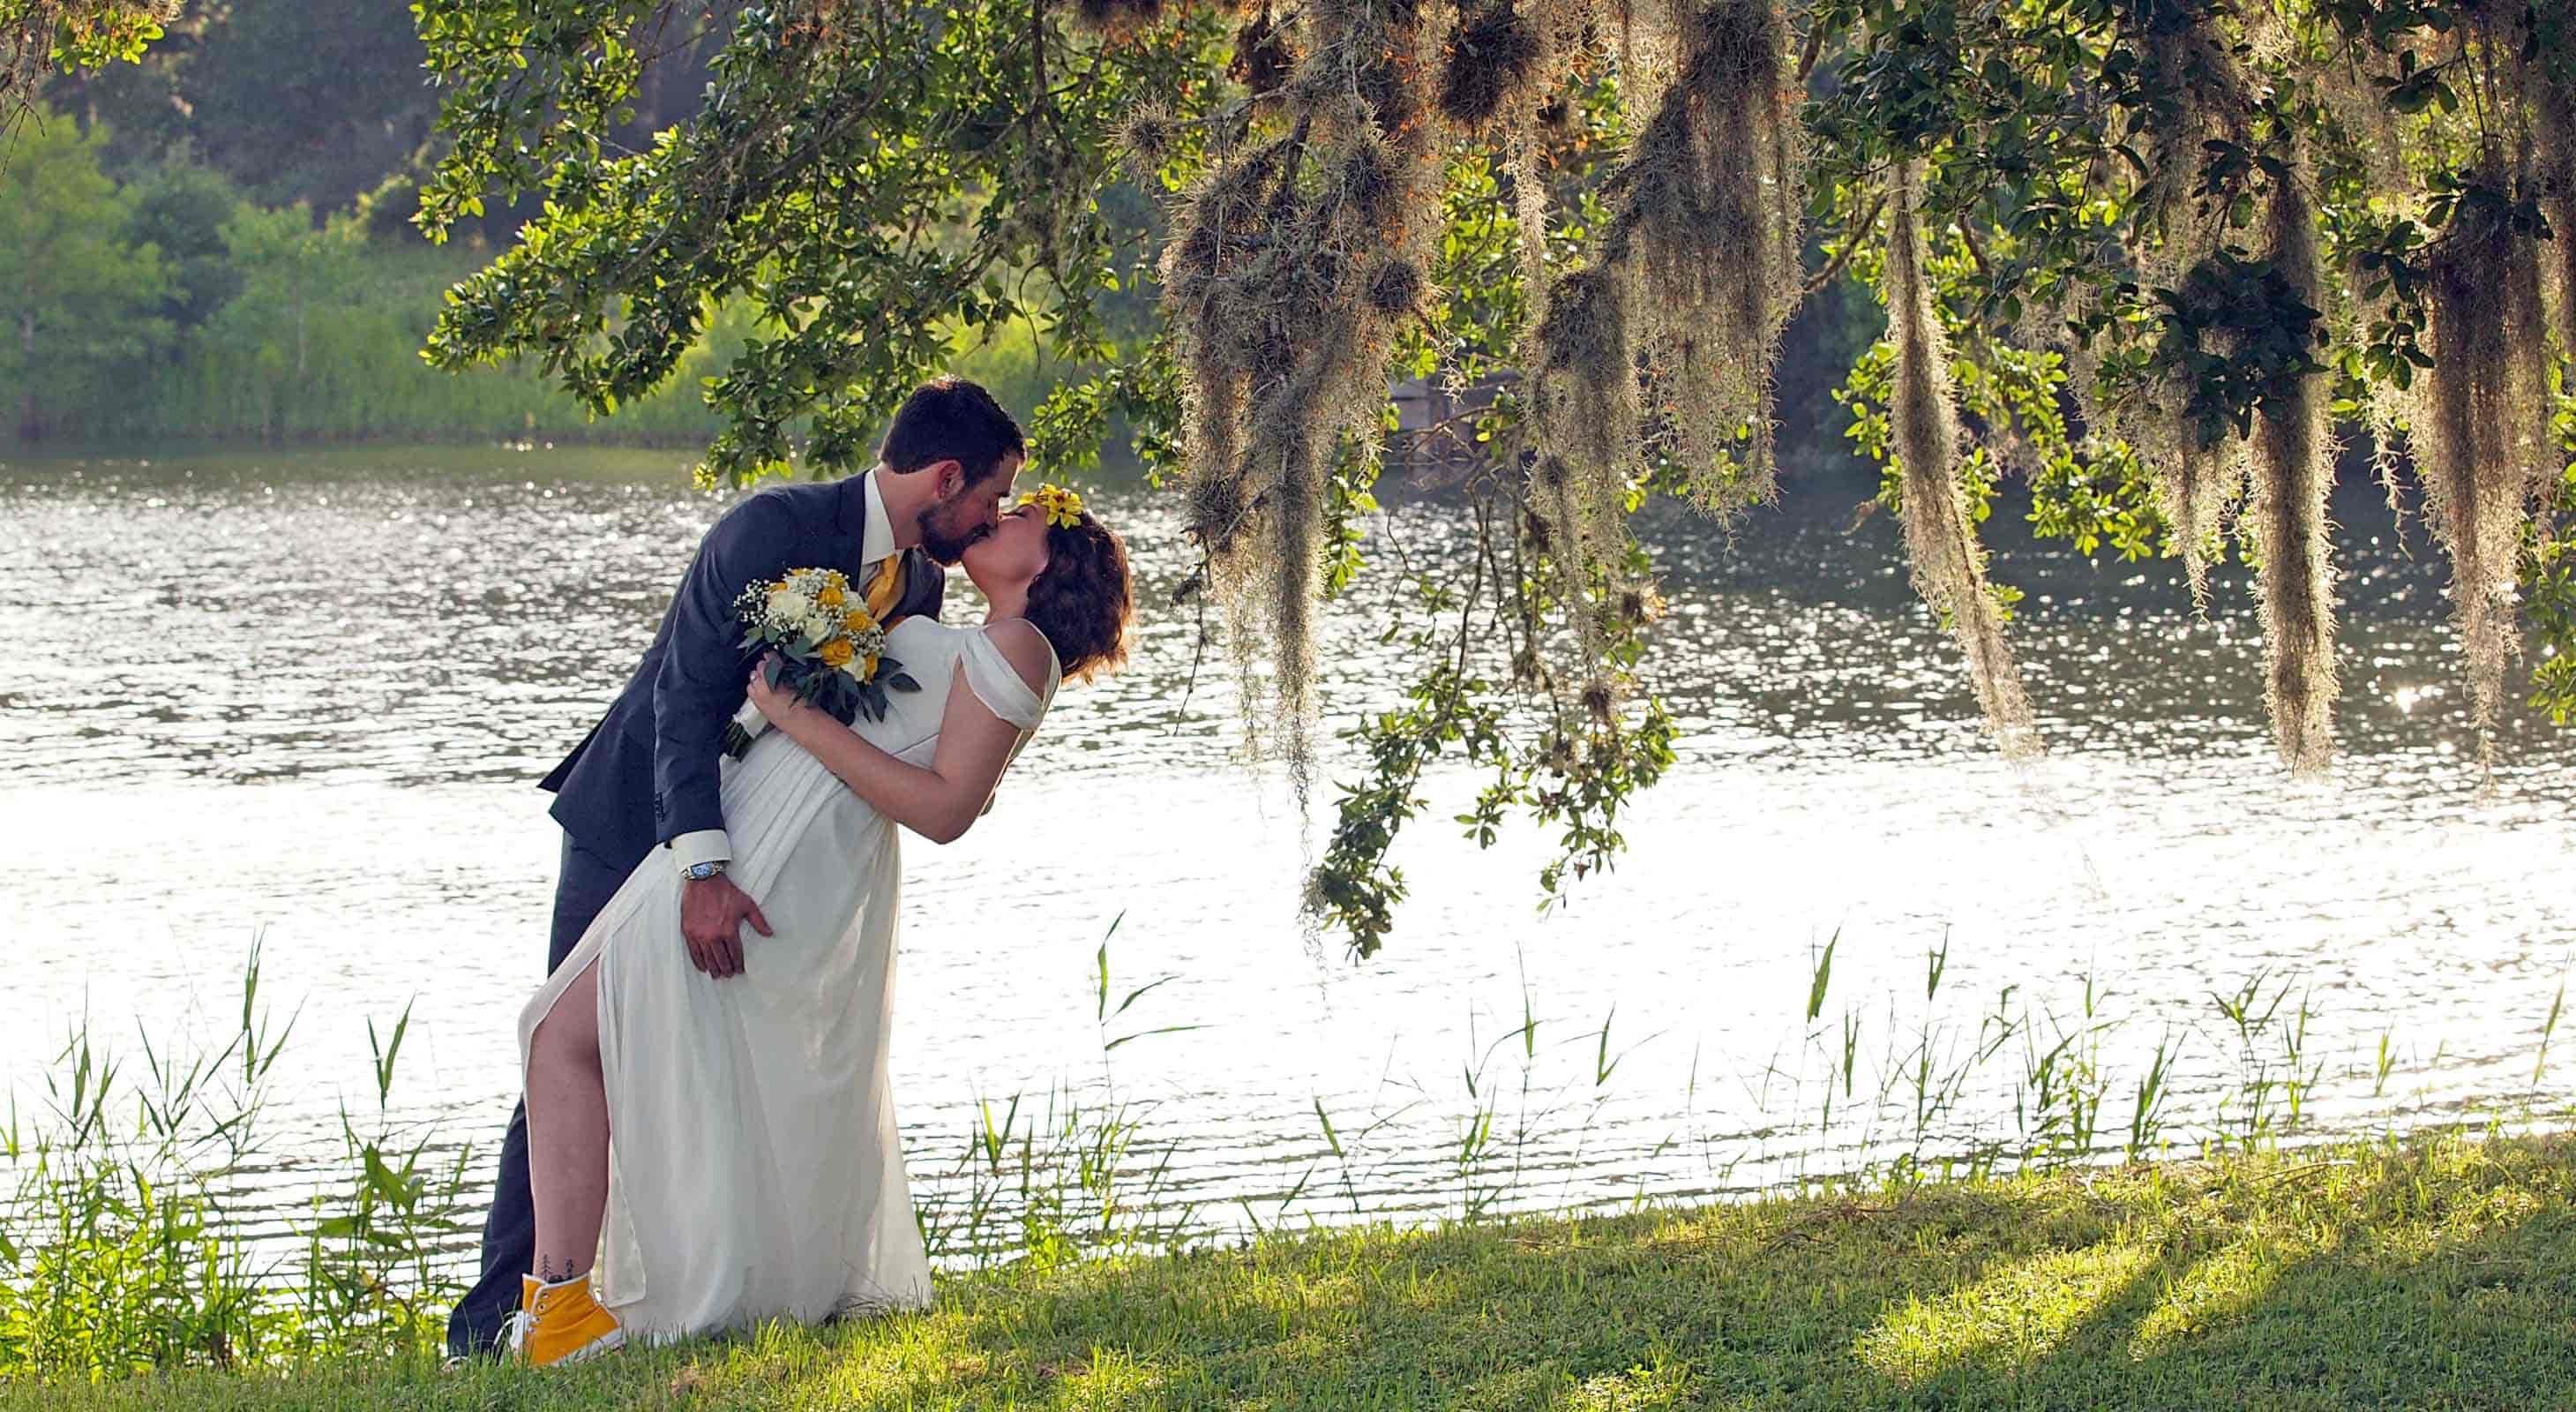 A couple kissing near a lake